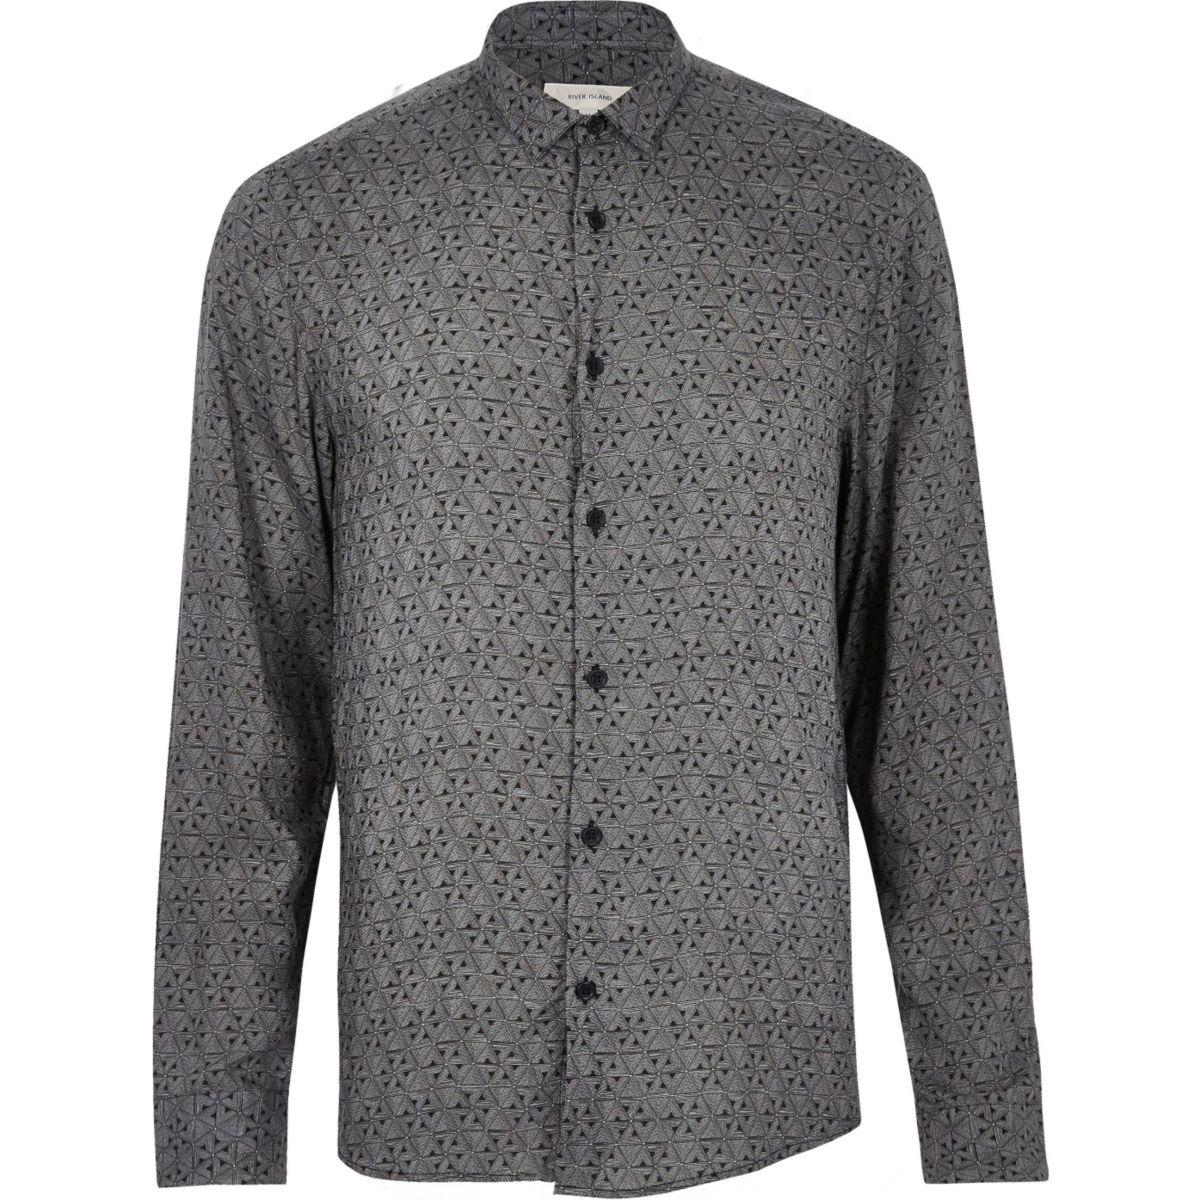 Black geo print casual shirt